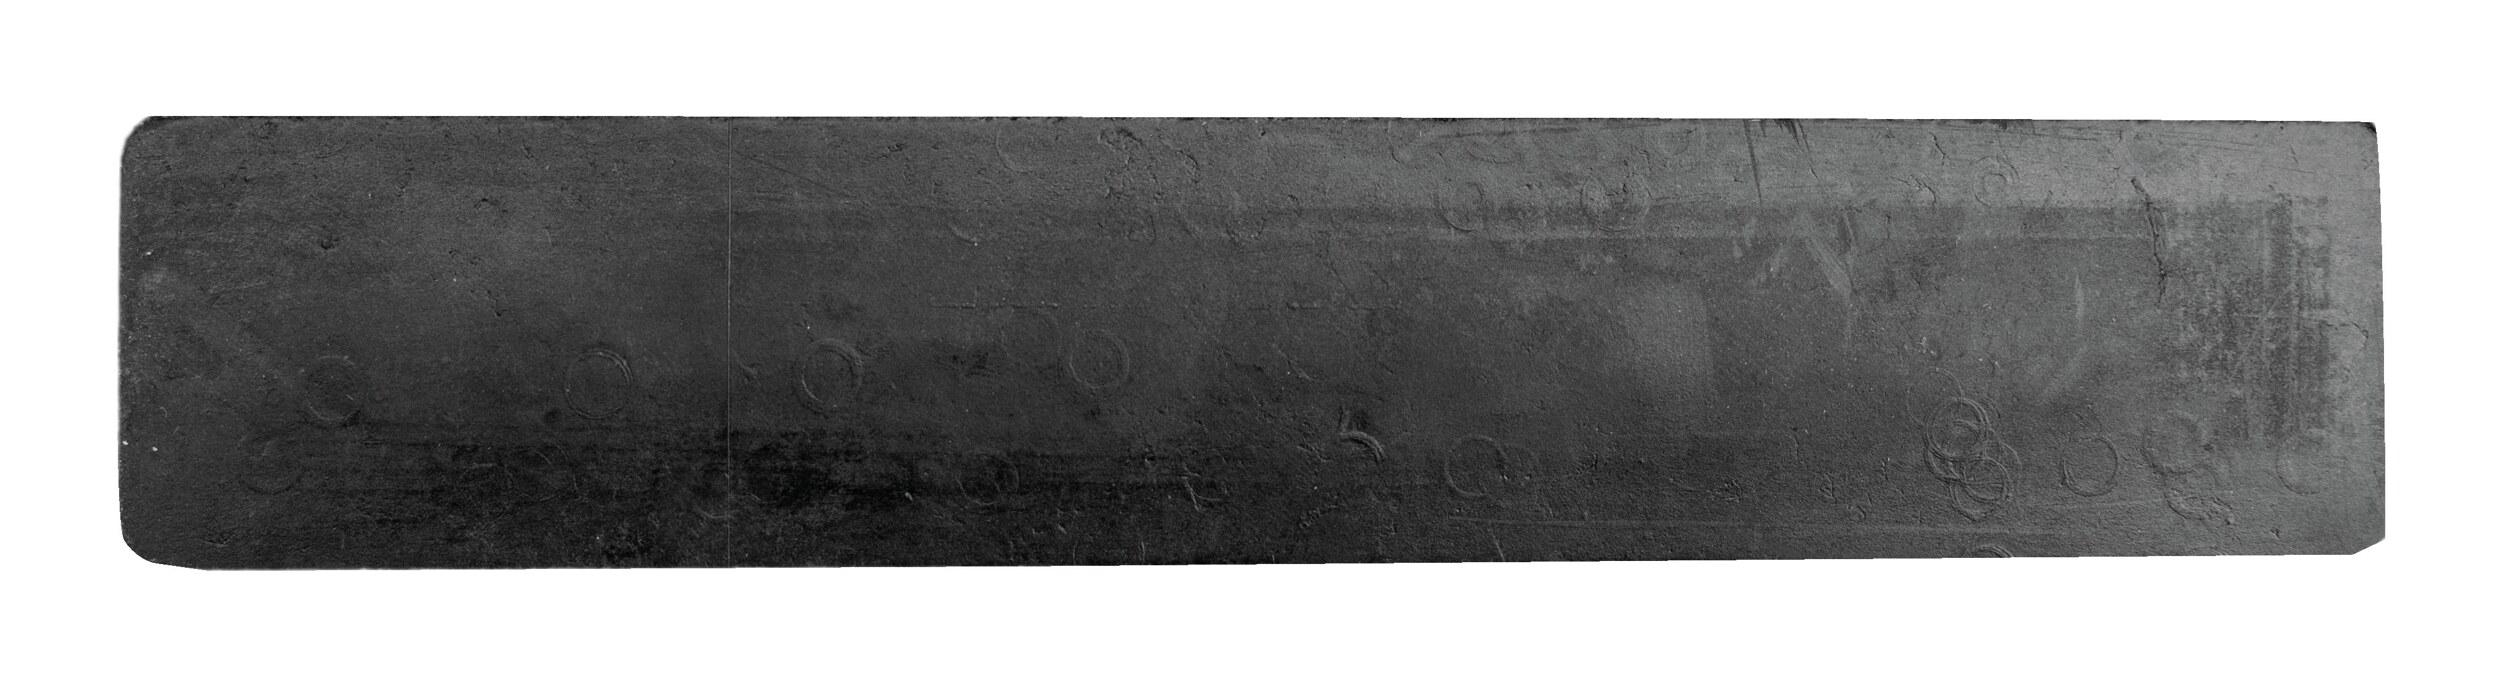 Ersatzgummi für KSH-R Gummi - KSH-R-0000-001